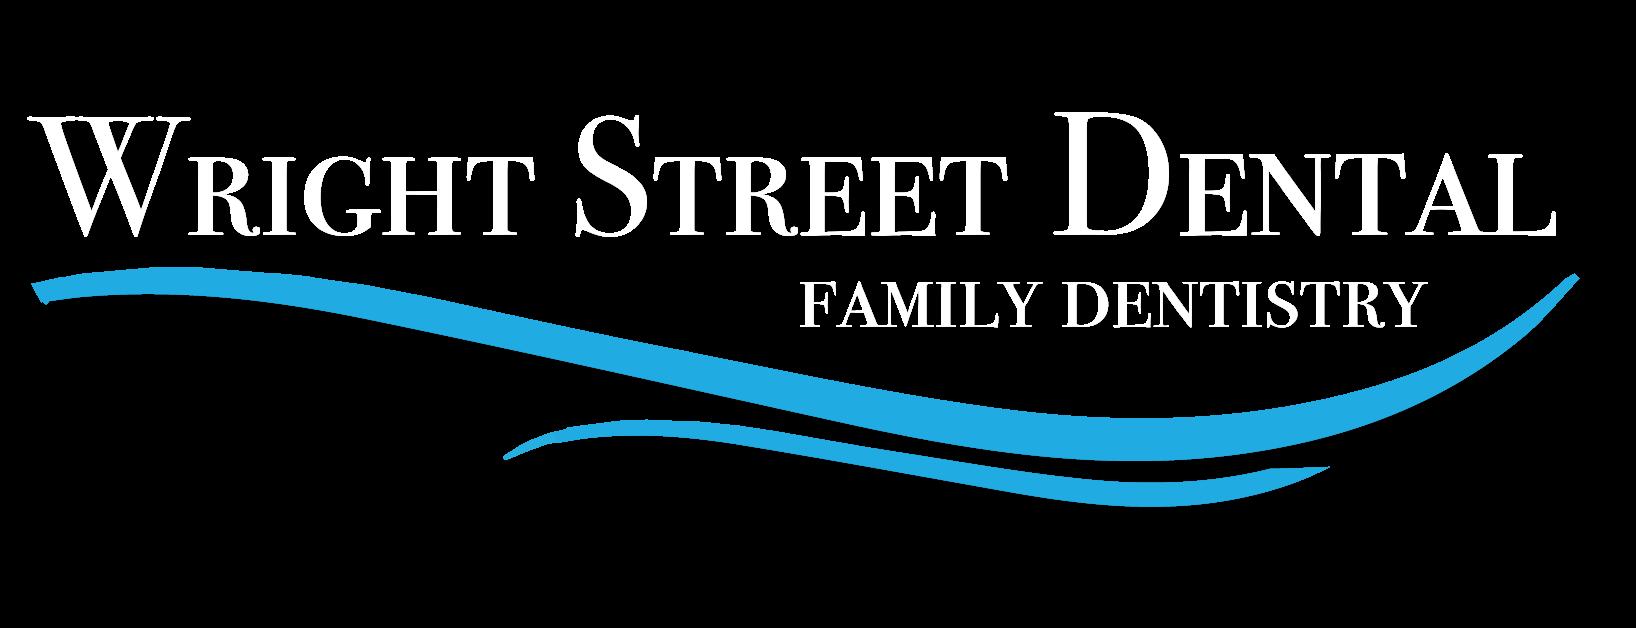 Wright Street Dental